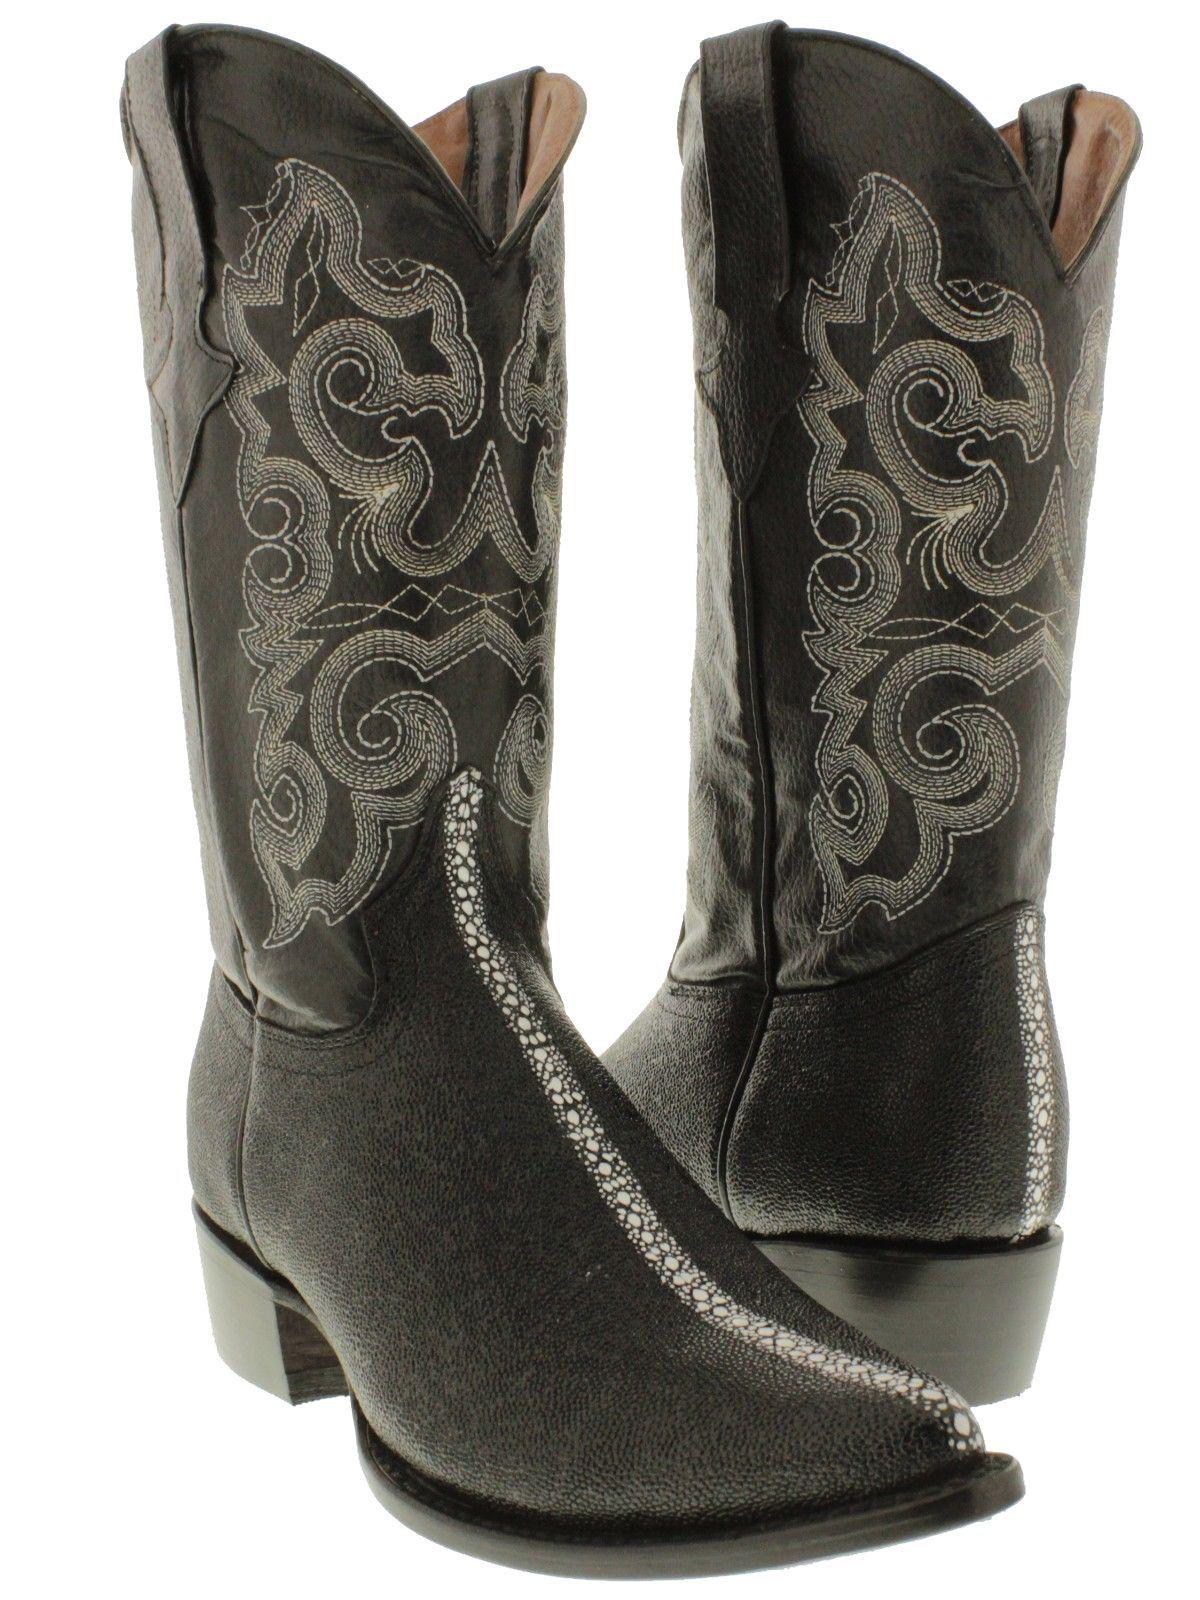 071dec7fd Men s Classic Black Exotic Stingray Row Stone Leather Cowboy Boots J ...